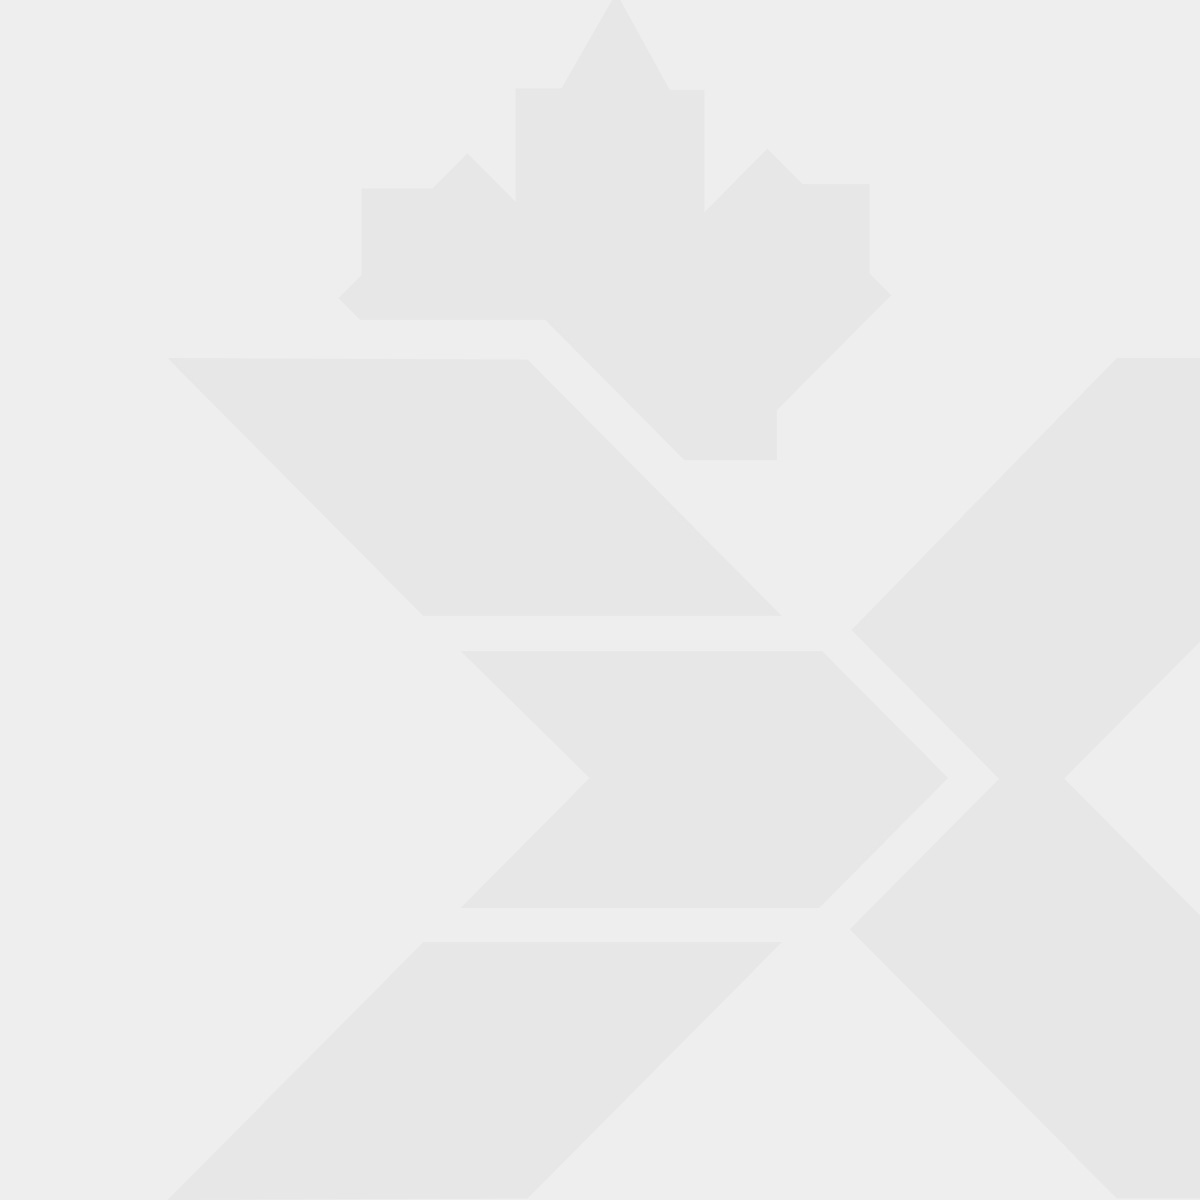 Michael Kors Darci Women's Pavé Gold Tone Watch (MK3191)